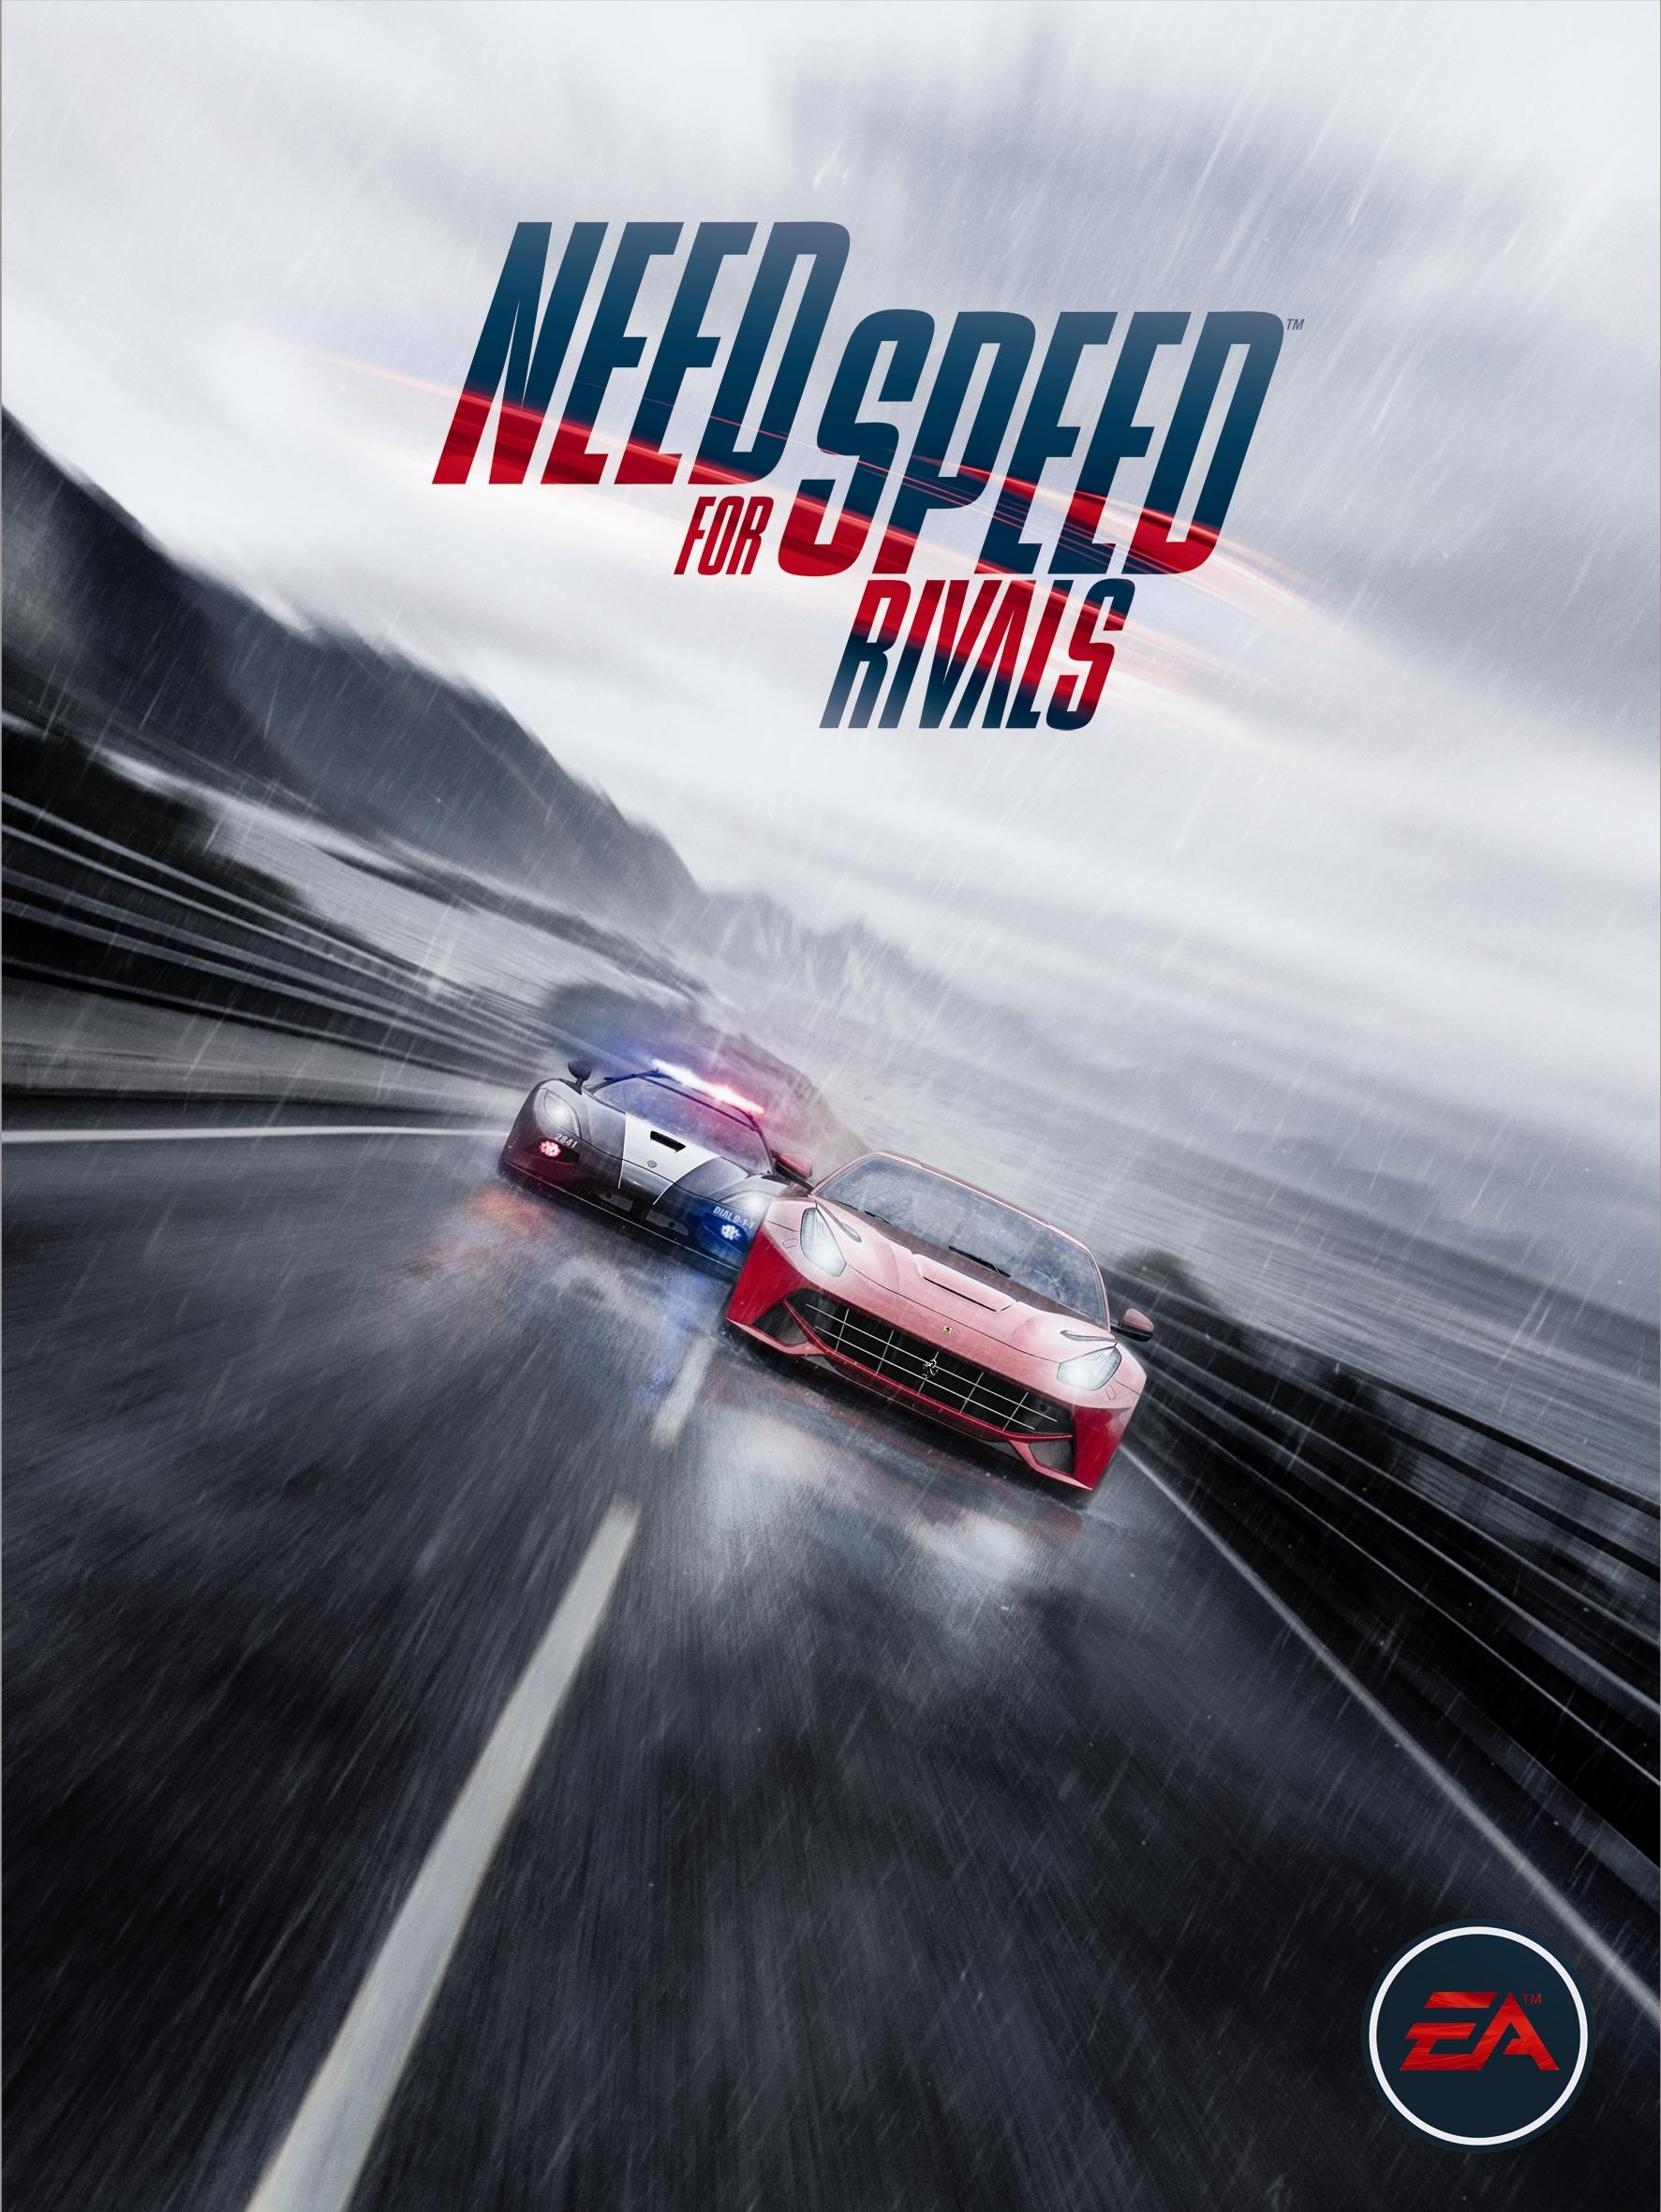 need_for_speed_rivals_key_art_jpg_jpgcopy